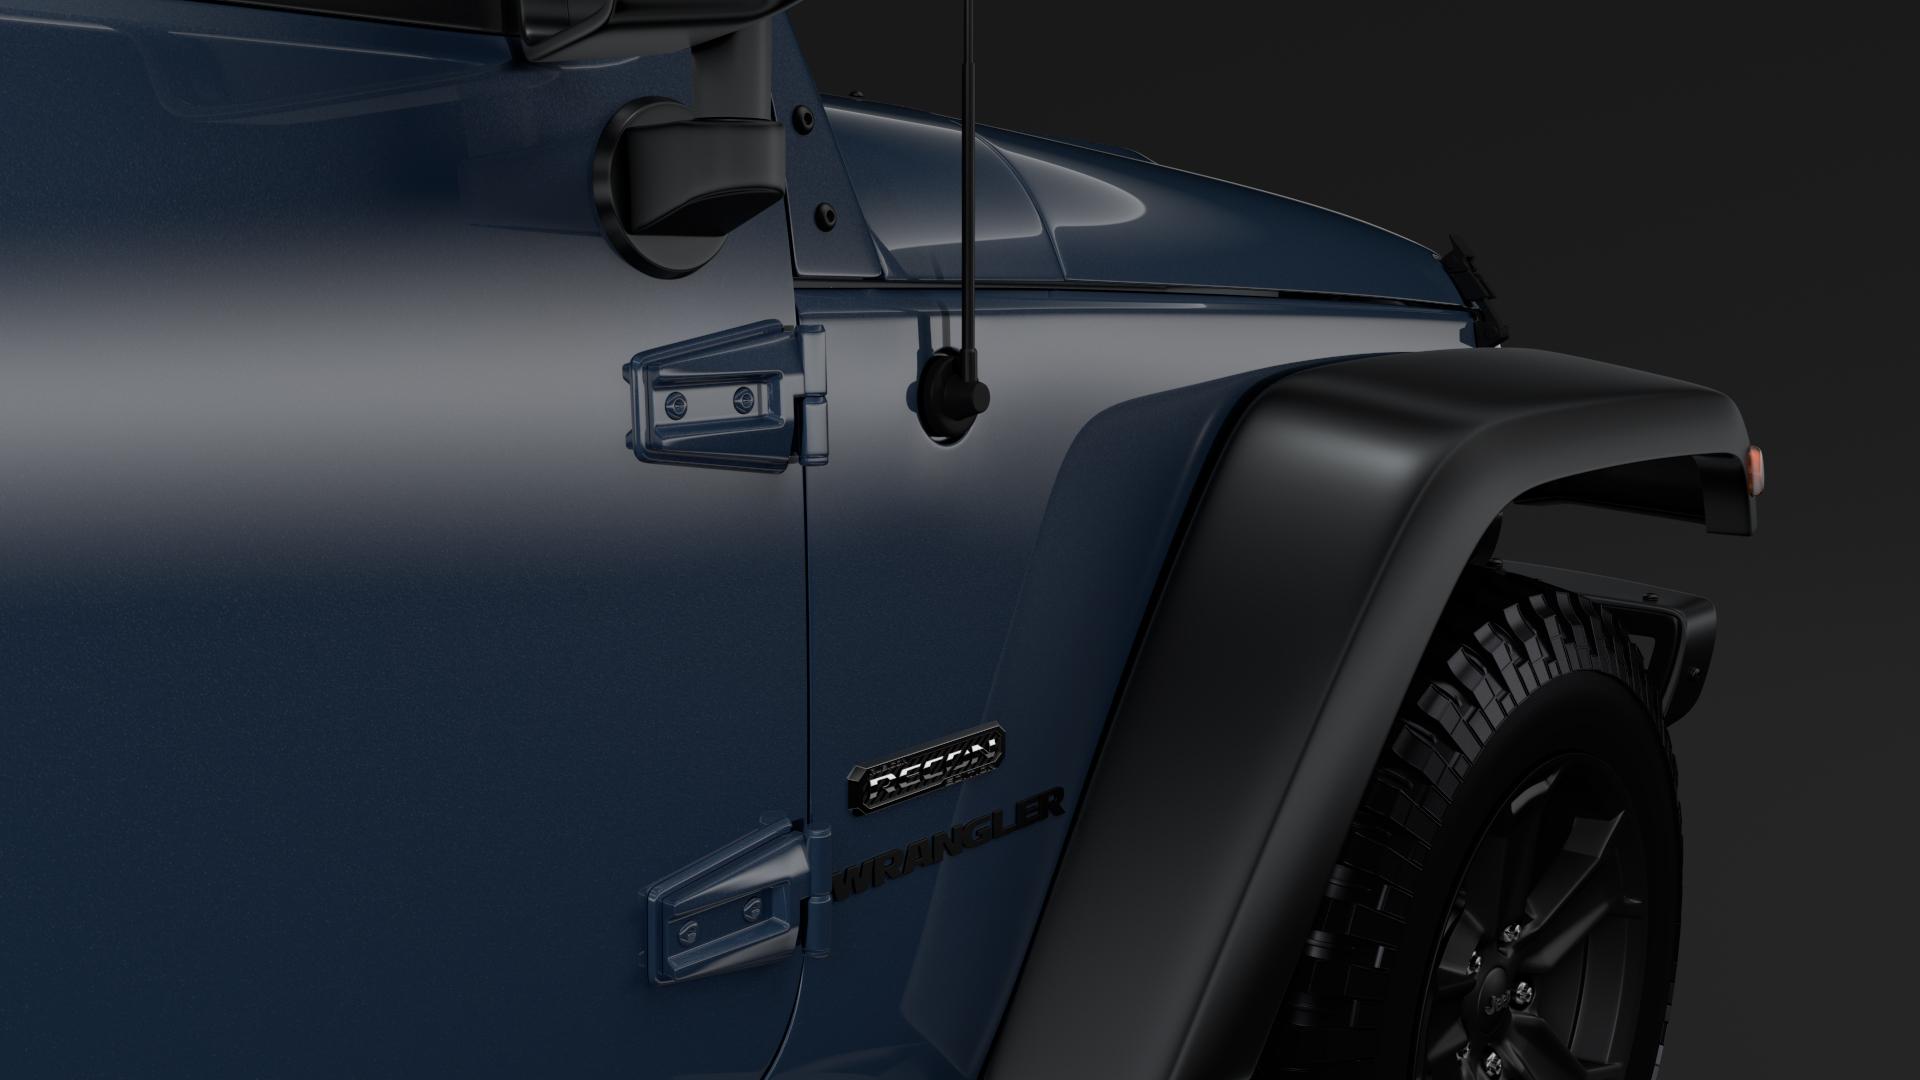 jeep wrangler unlimited rubicon recon jk 2017 3d model max fbx c4d lwo ma mb hrc xsi obj 277003